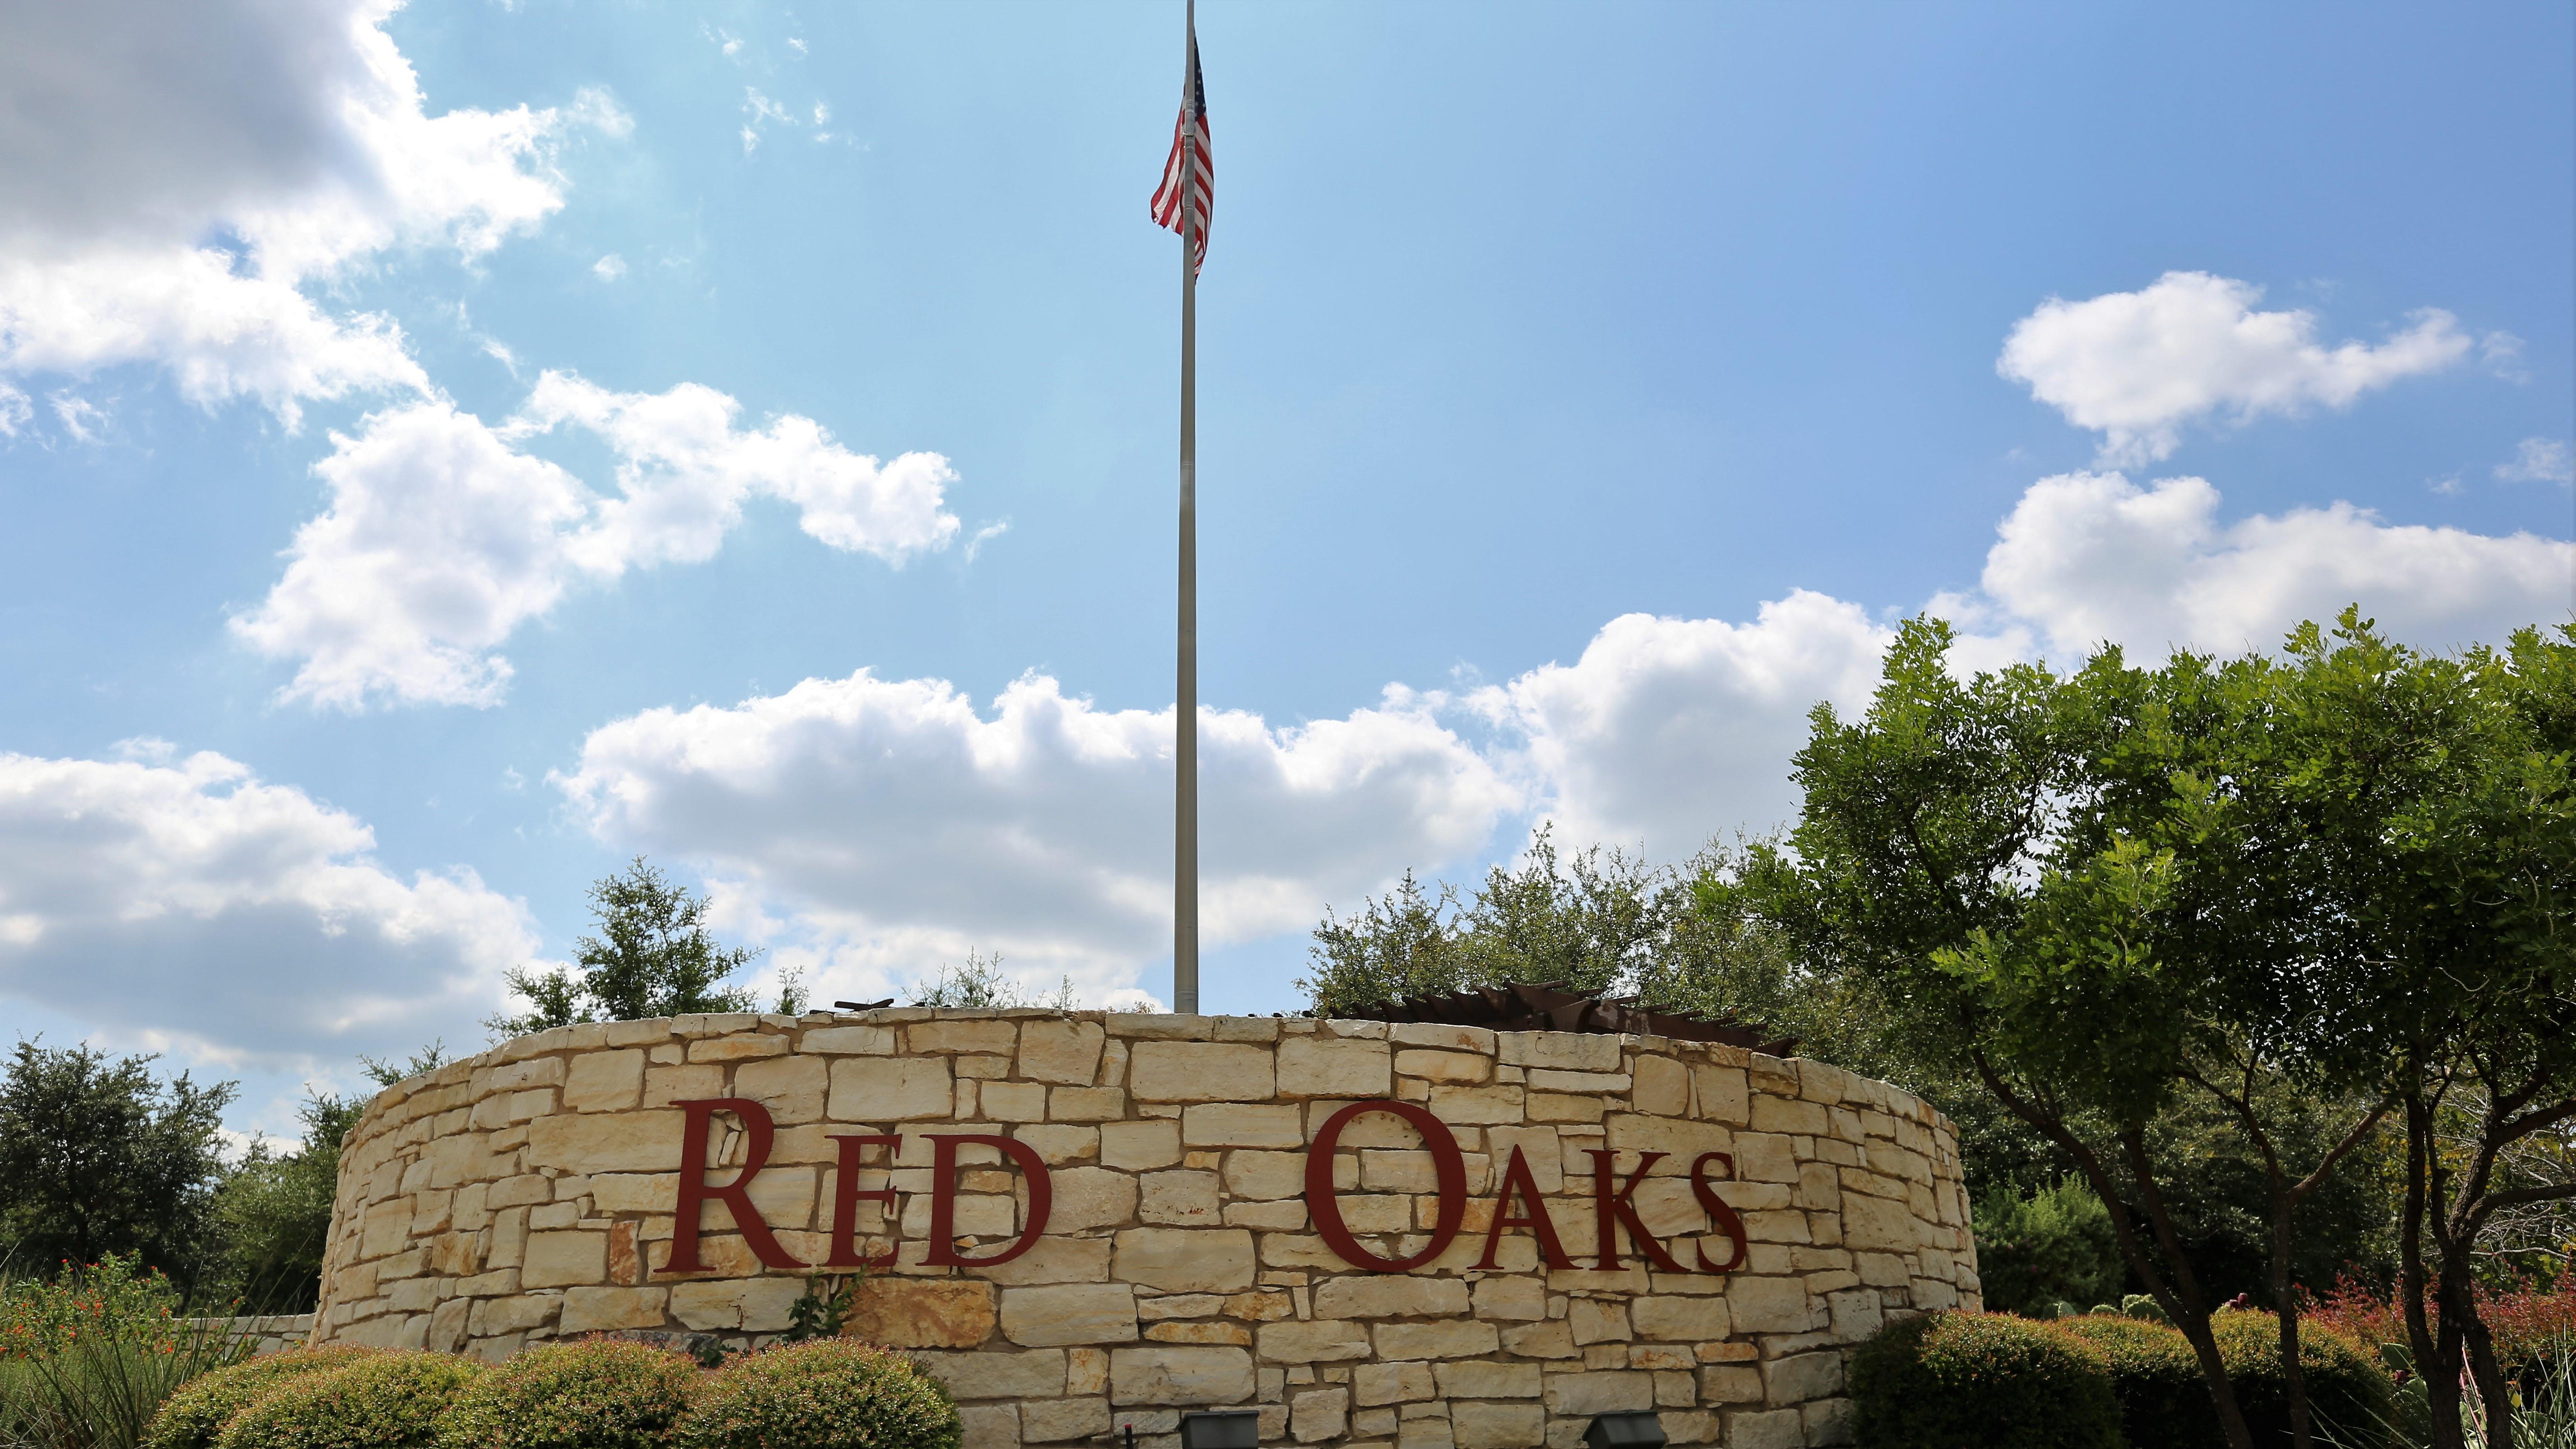 Red Oaks, Cedar Park TX